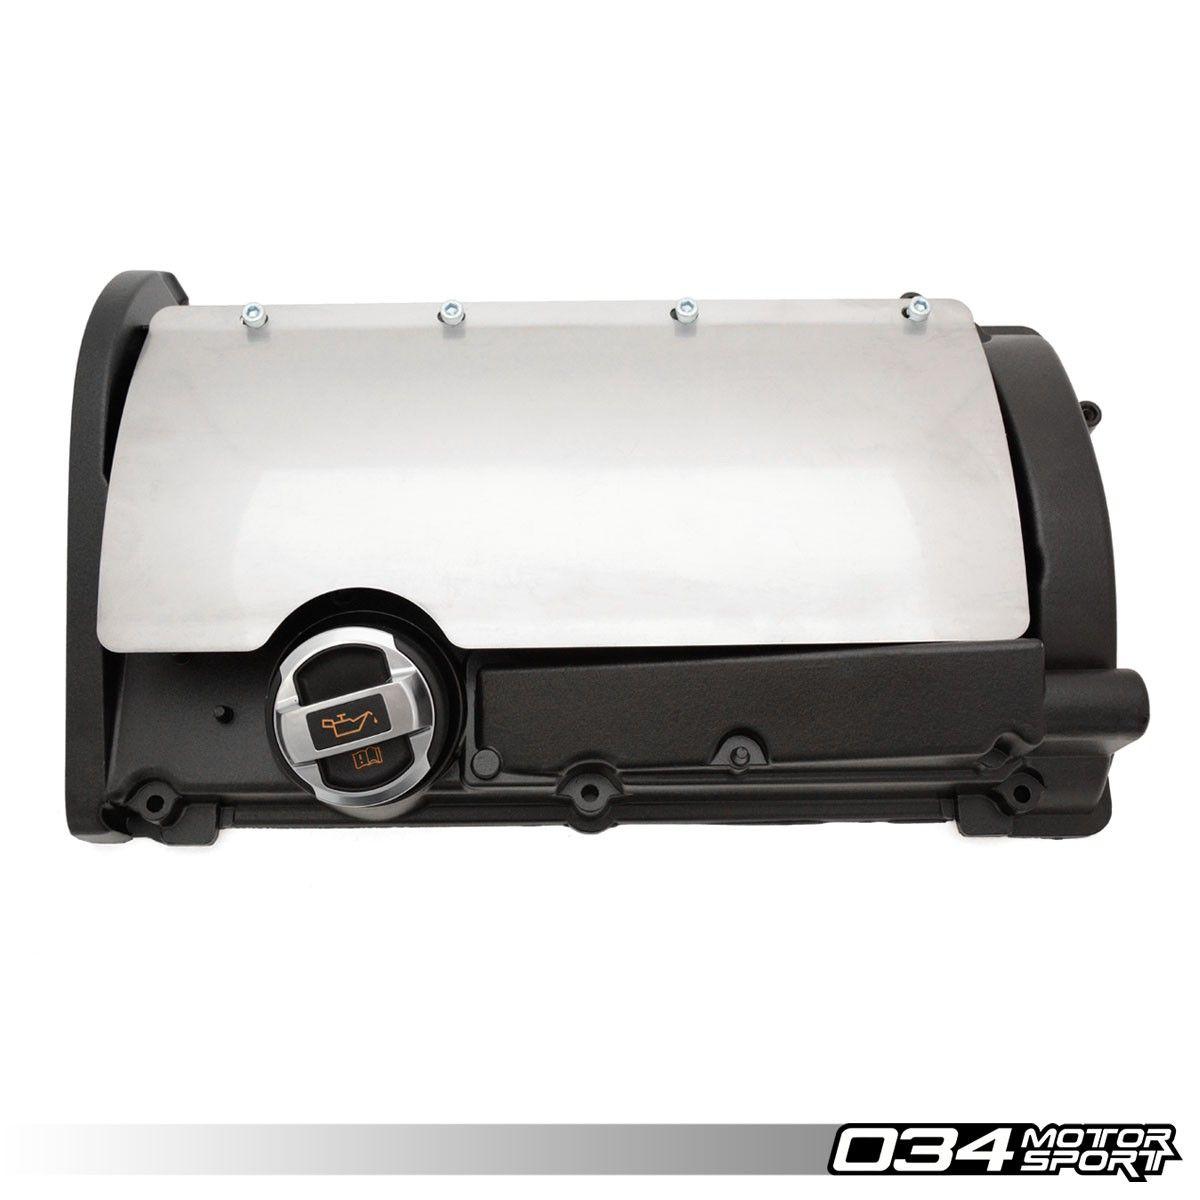 Coil Cover Audi Volkswagen 1 8t Stainless Steel 034 107 Z018 Audi Volkswagen Coil